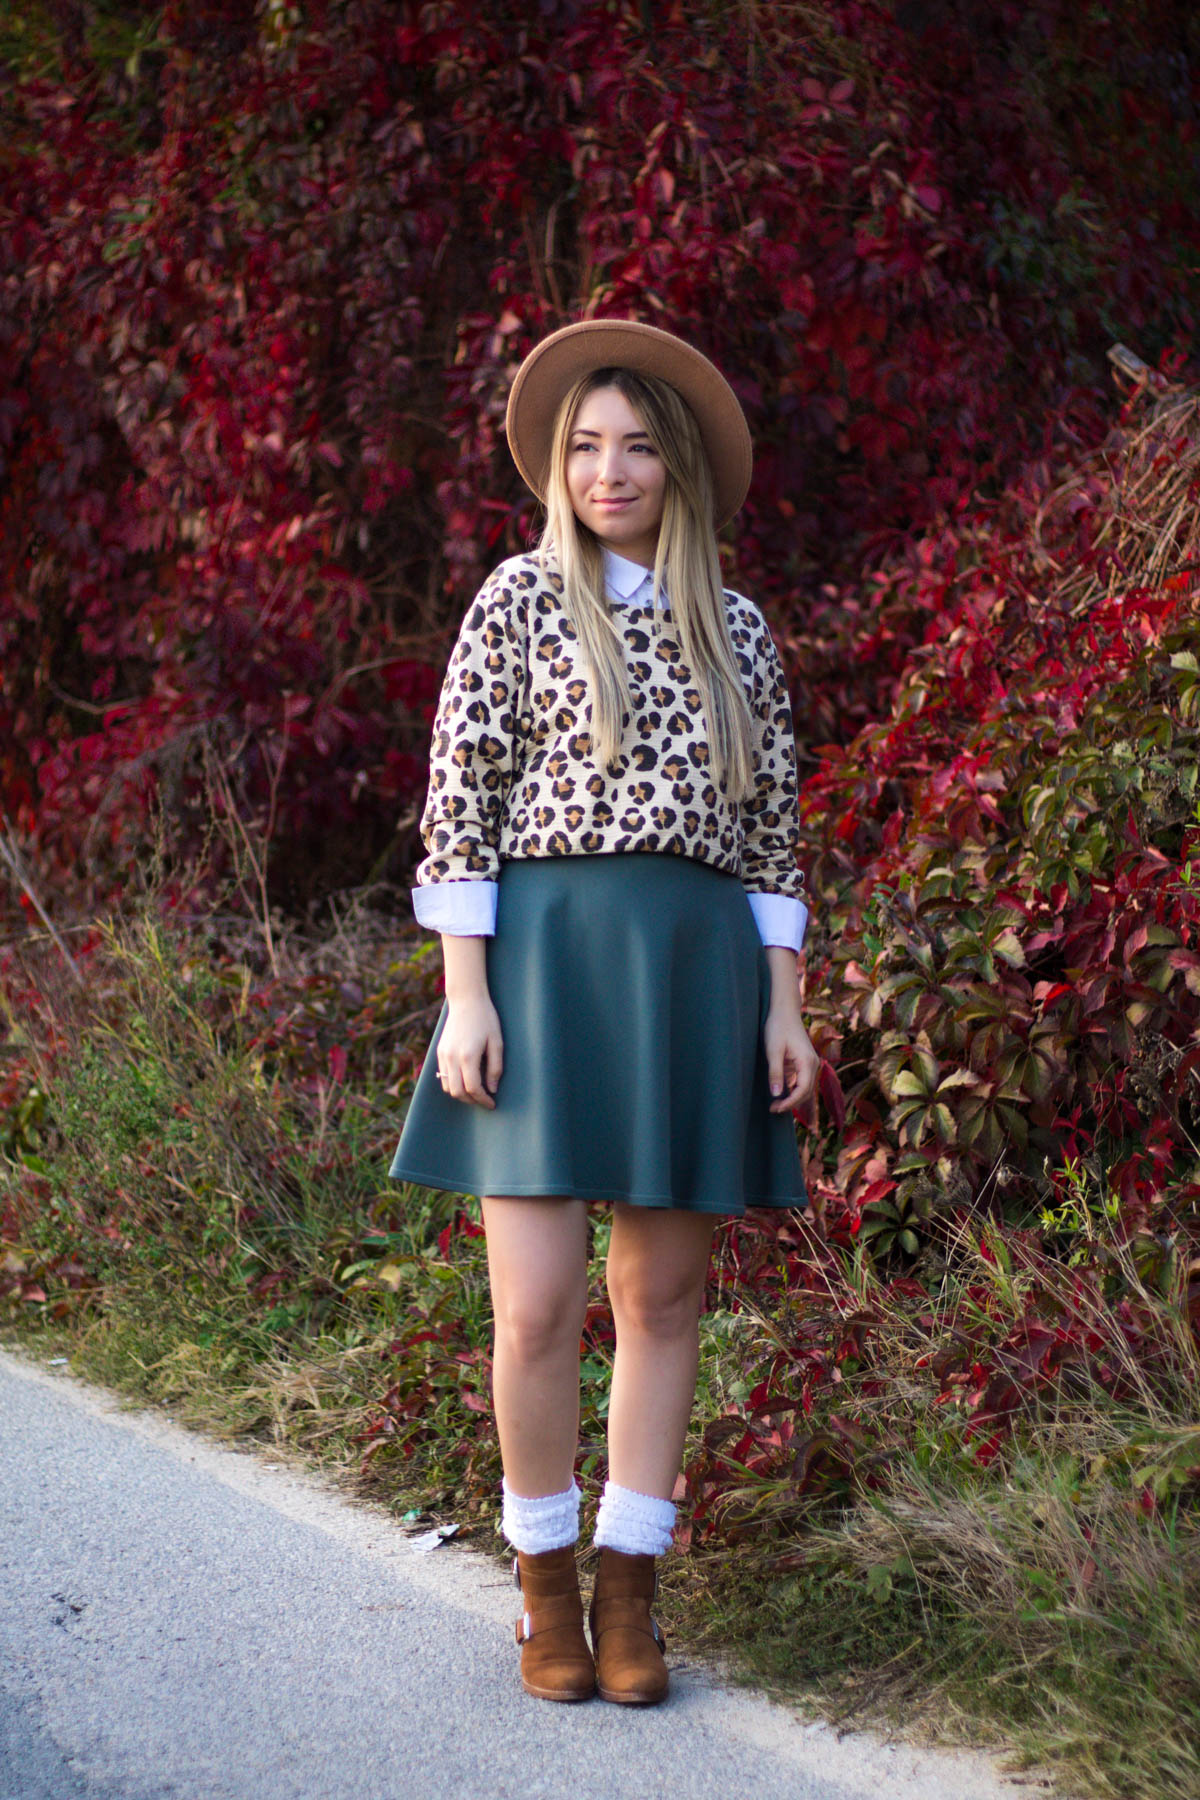 Street style, autumn look, leopard print blouse, white shirt, military green skirt, brown boots, white socks, andreea ristea blog